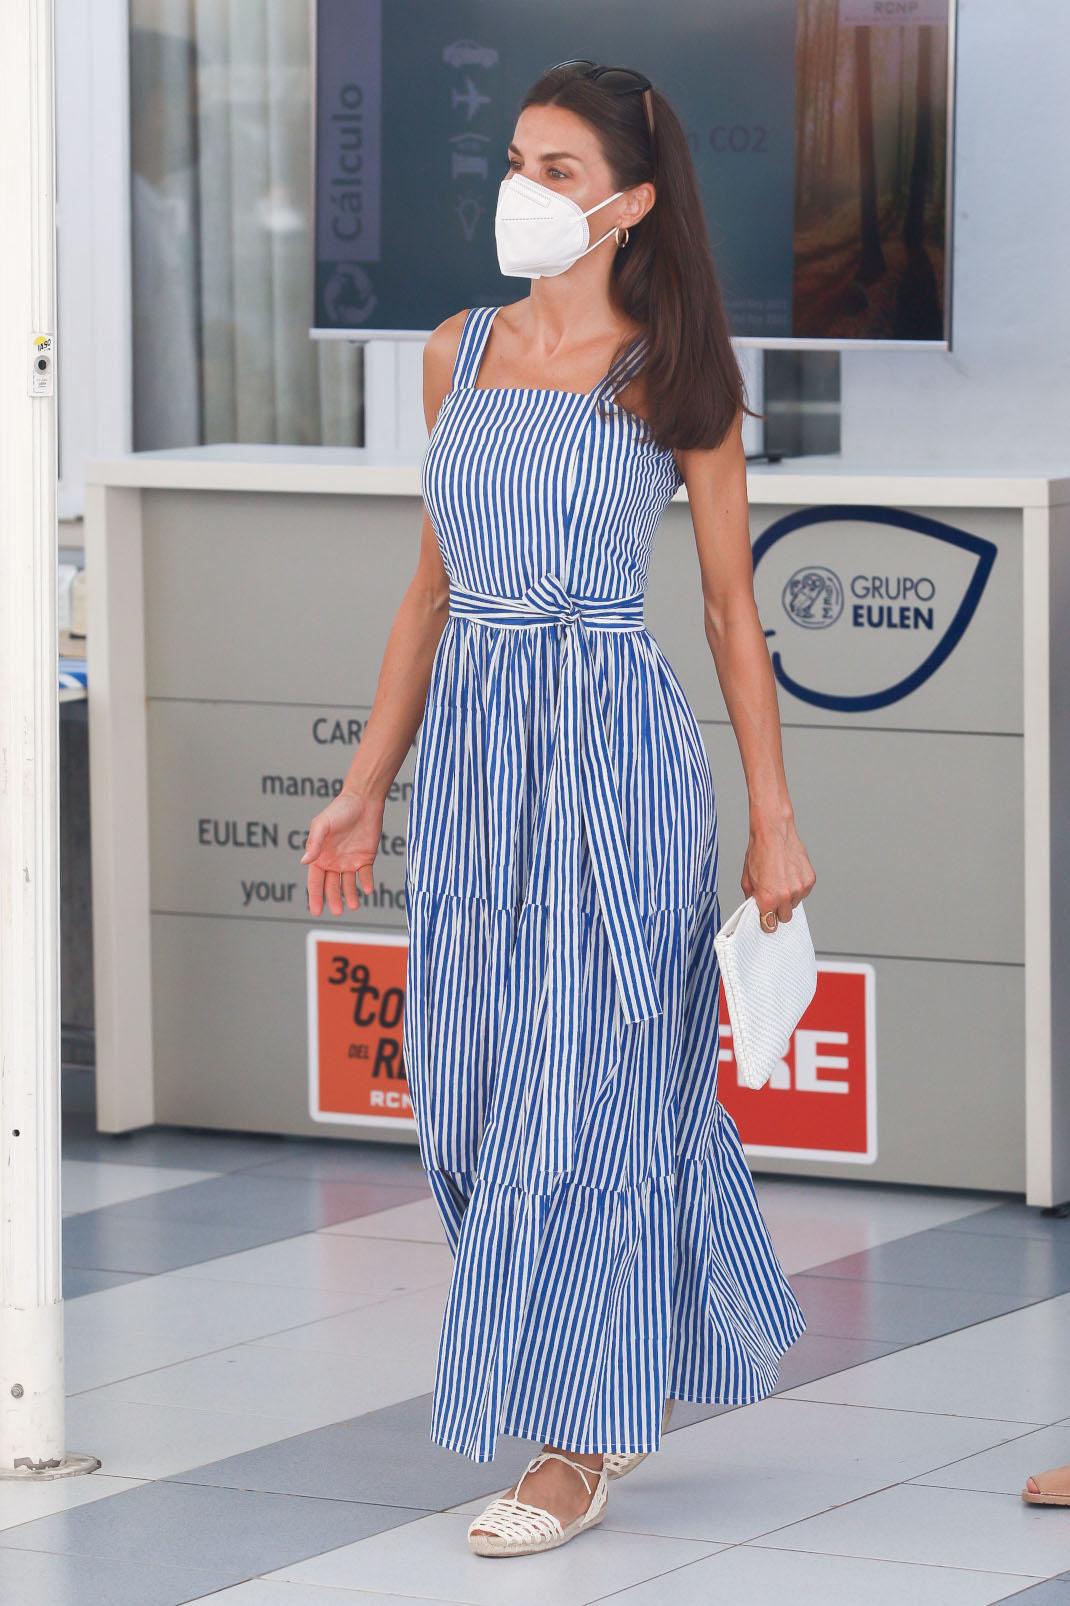 H βασίλισσα Λετίθια με σούπερ σικ navy φόρεμα